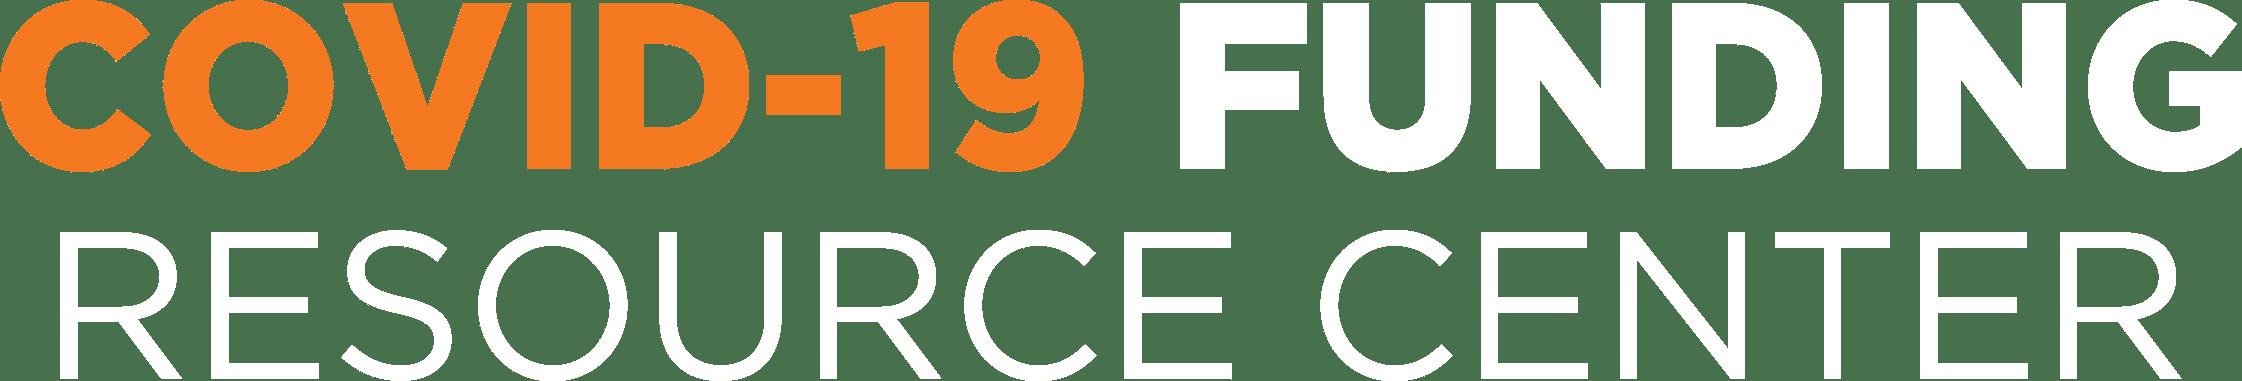 COVID-19FundingResourceCenter_Logo-big